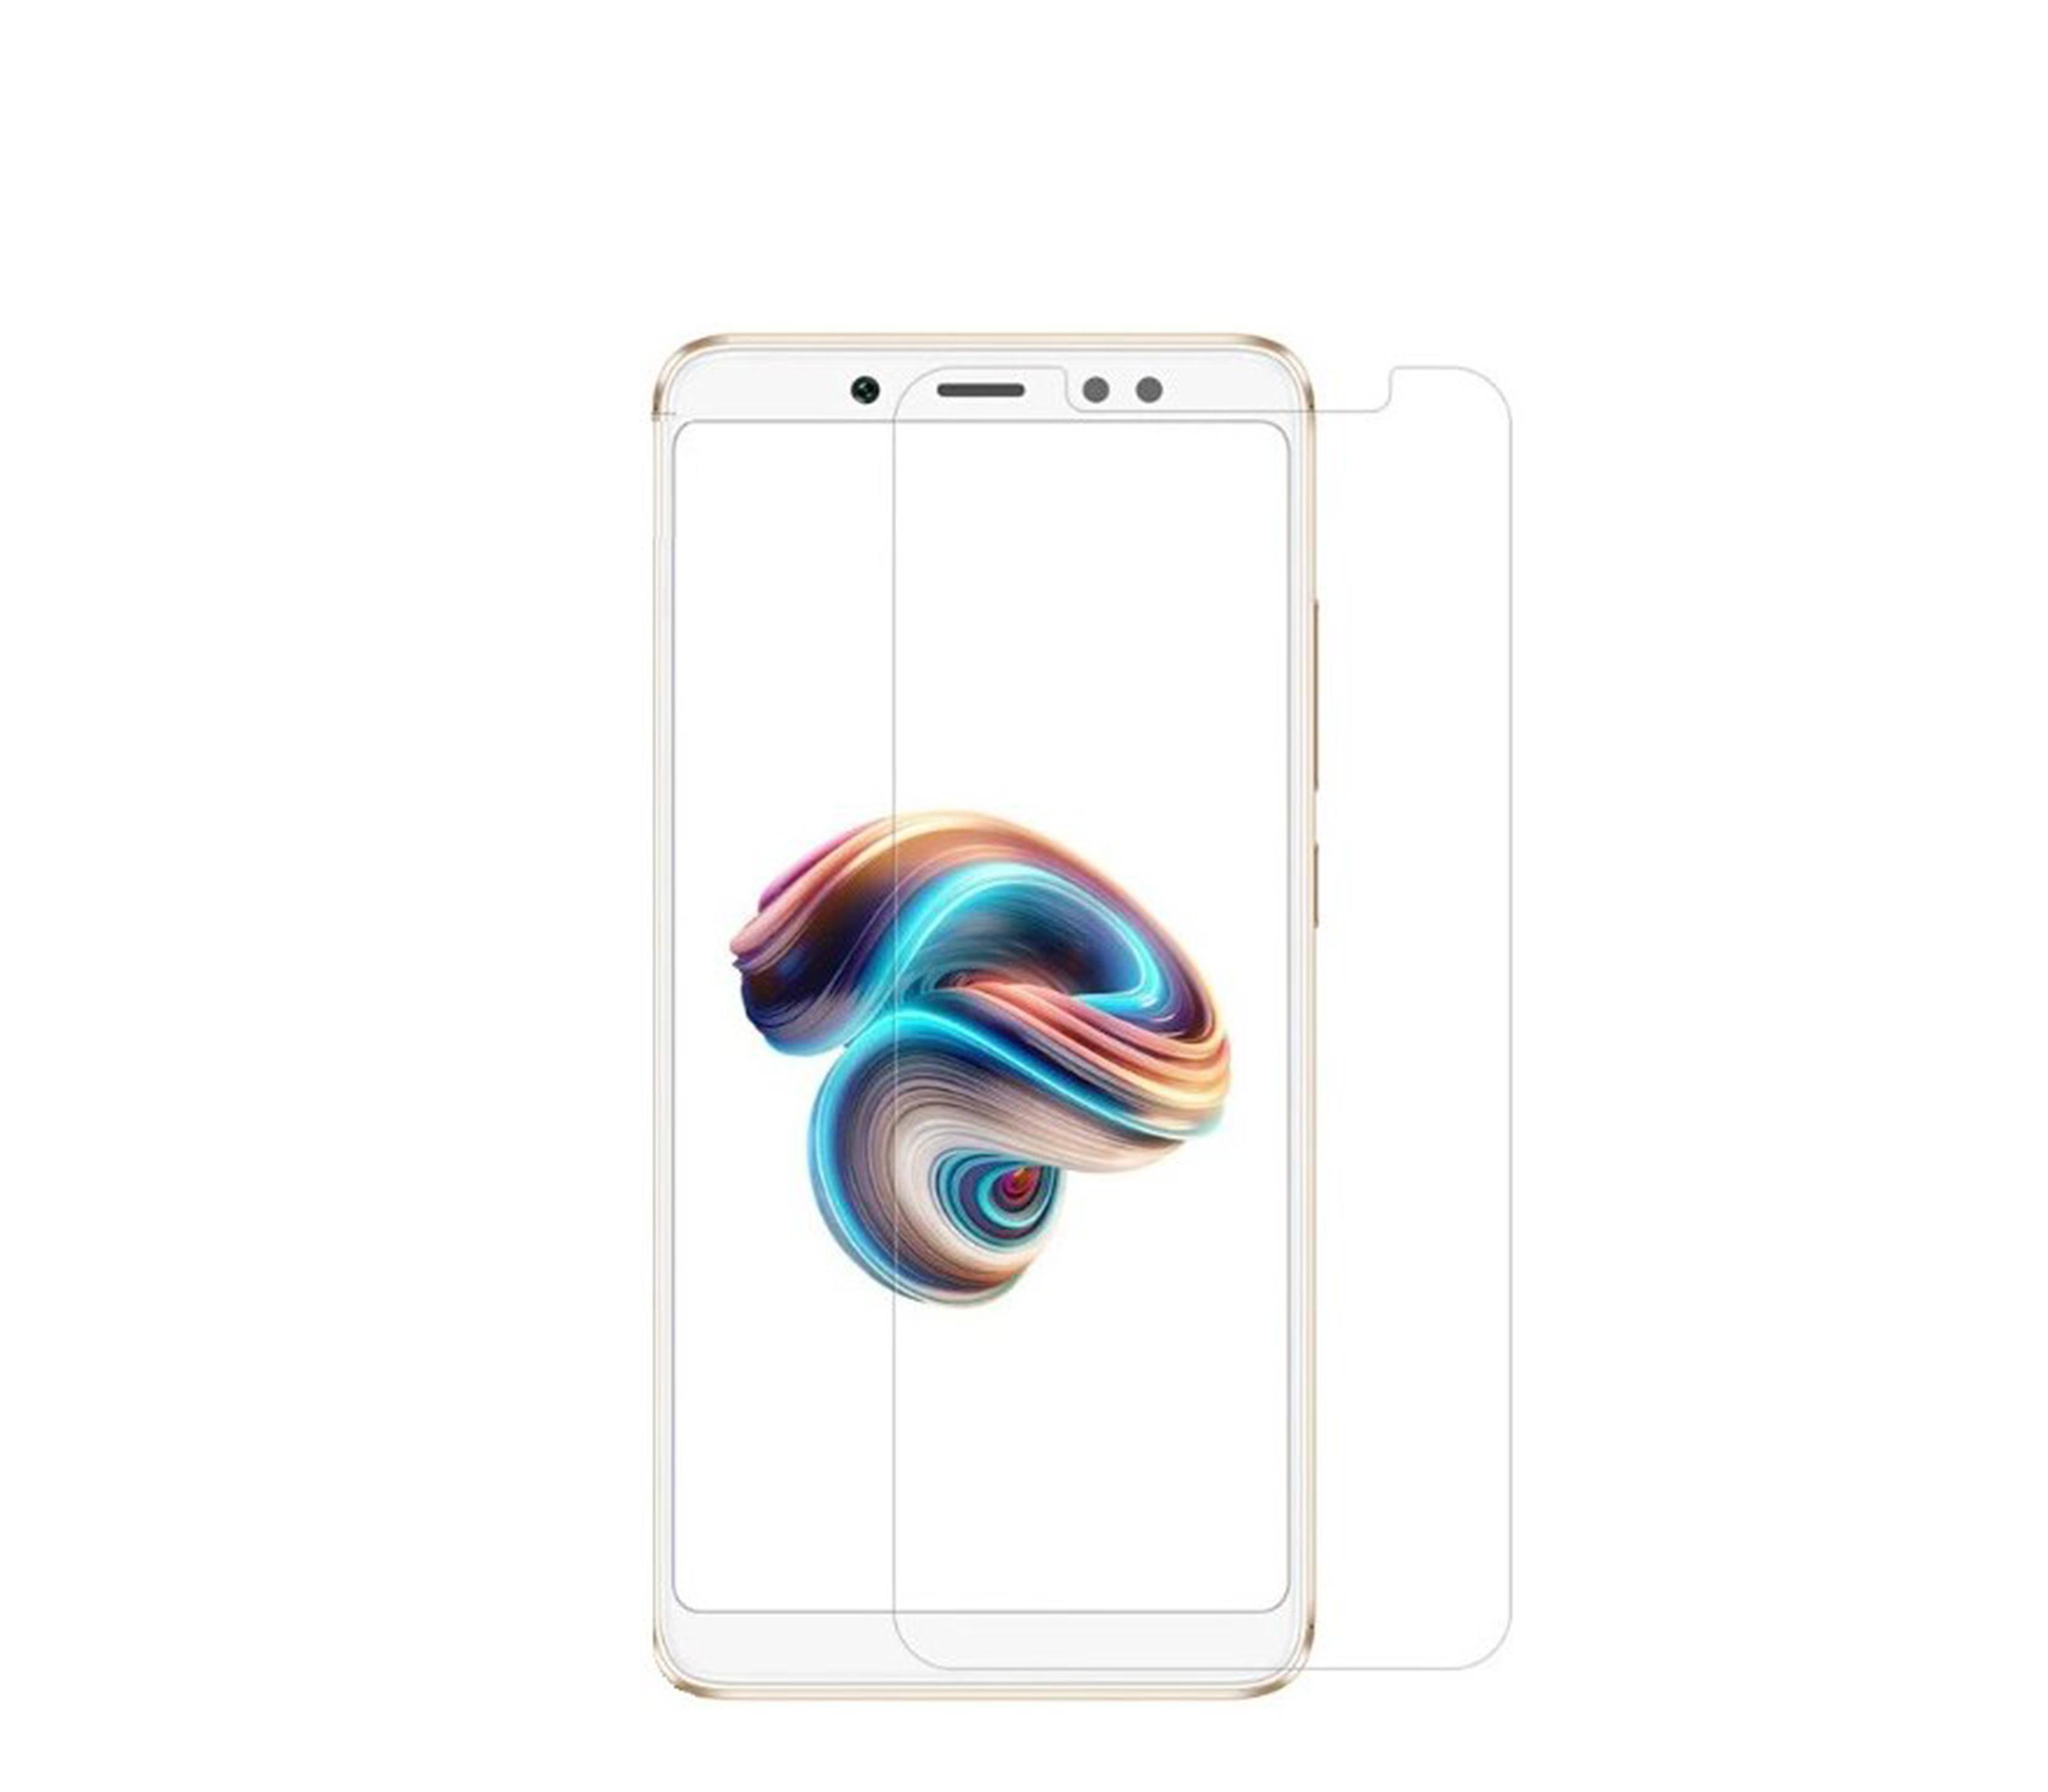 Aga Tvrzené sklo pro Xiaomi Redmi Note 5